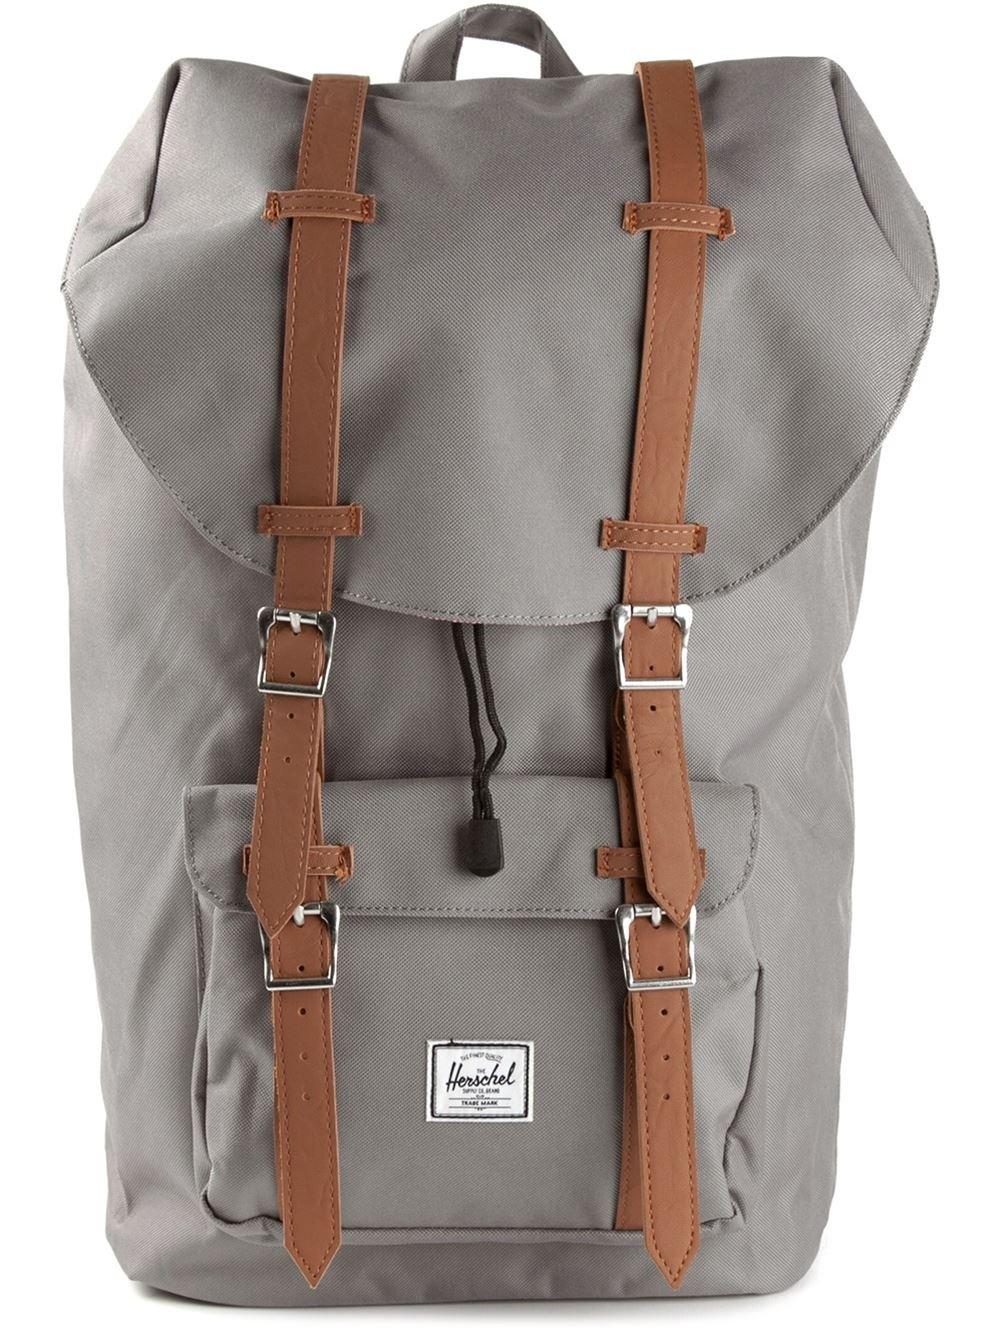 Lyst - Herschel Supply Co. Little America Backpack in Gray for Men 9e4f0820f3